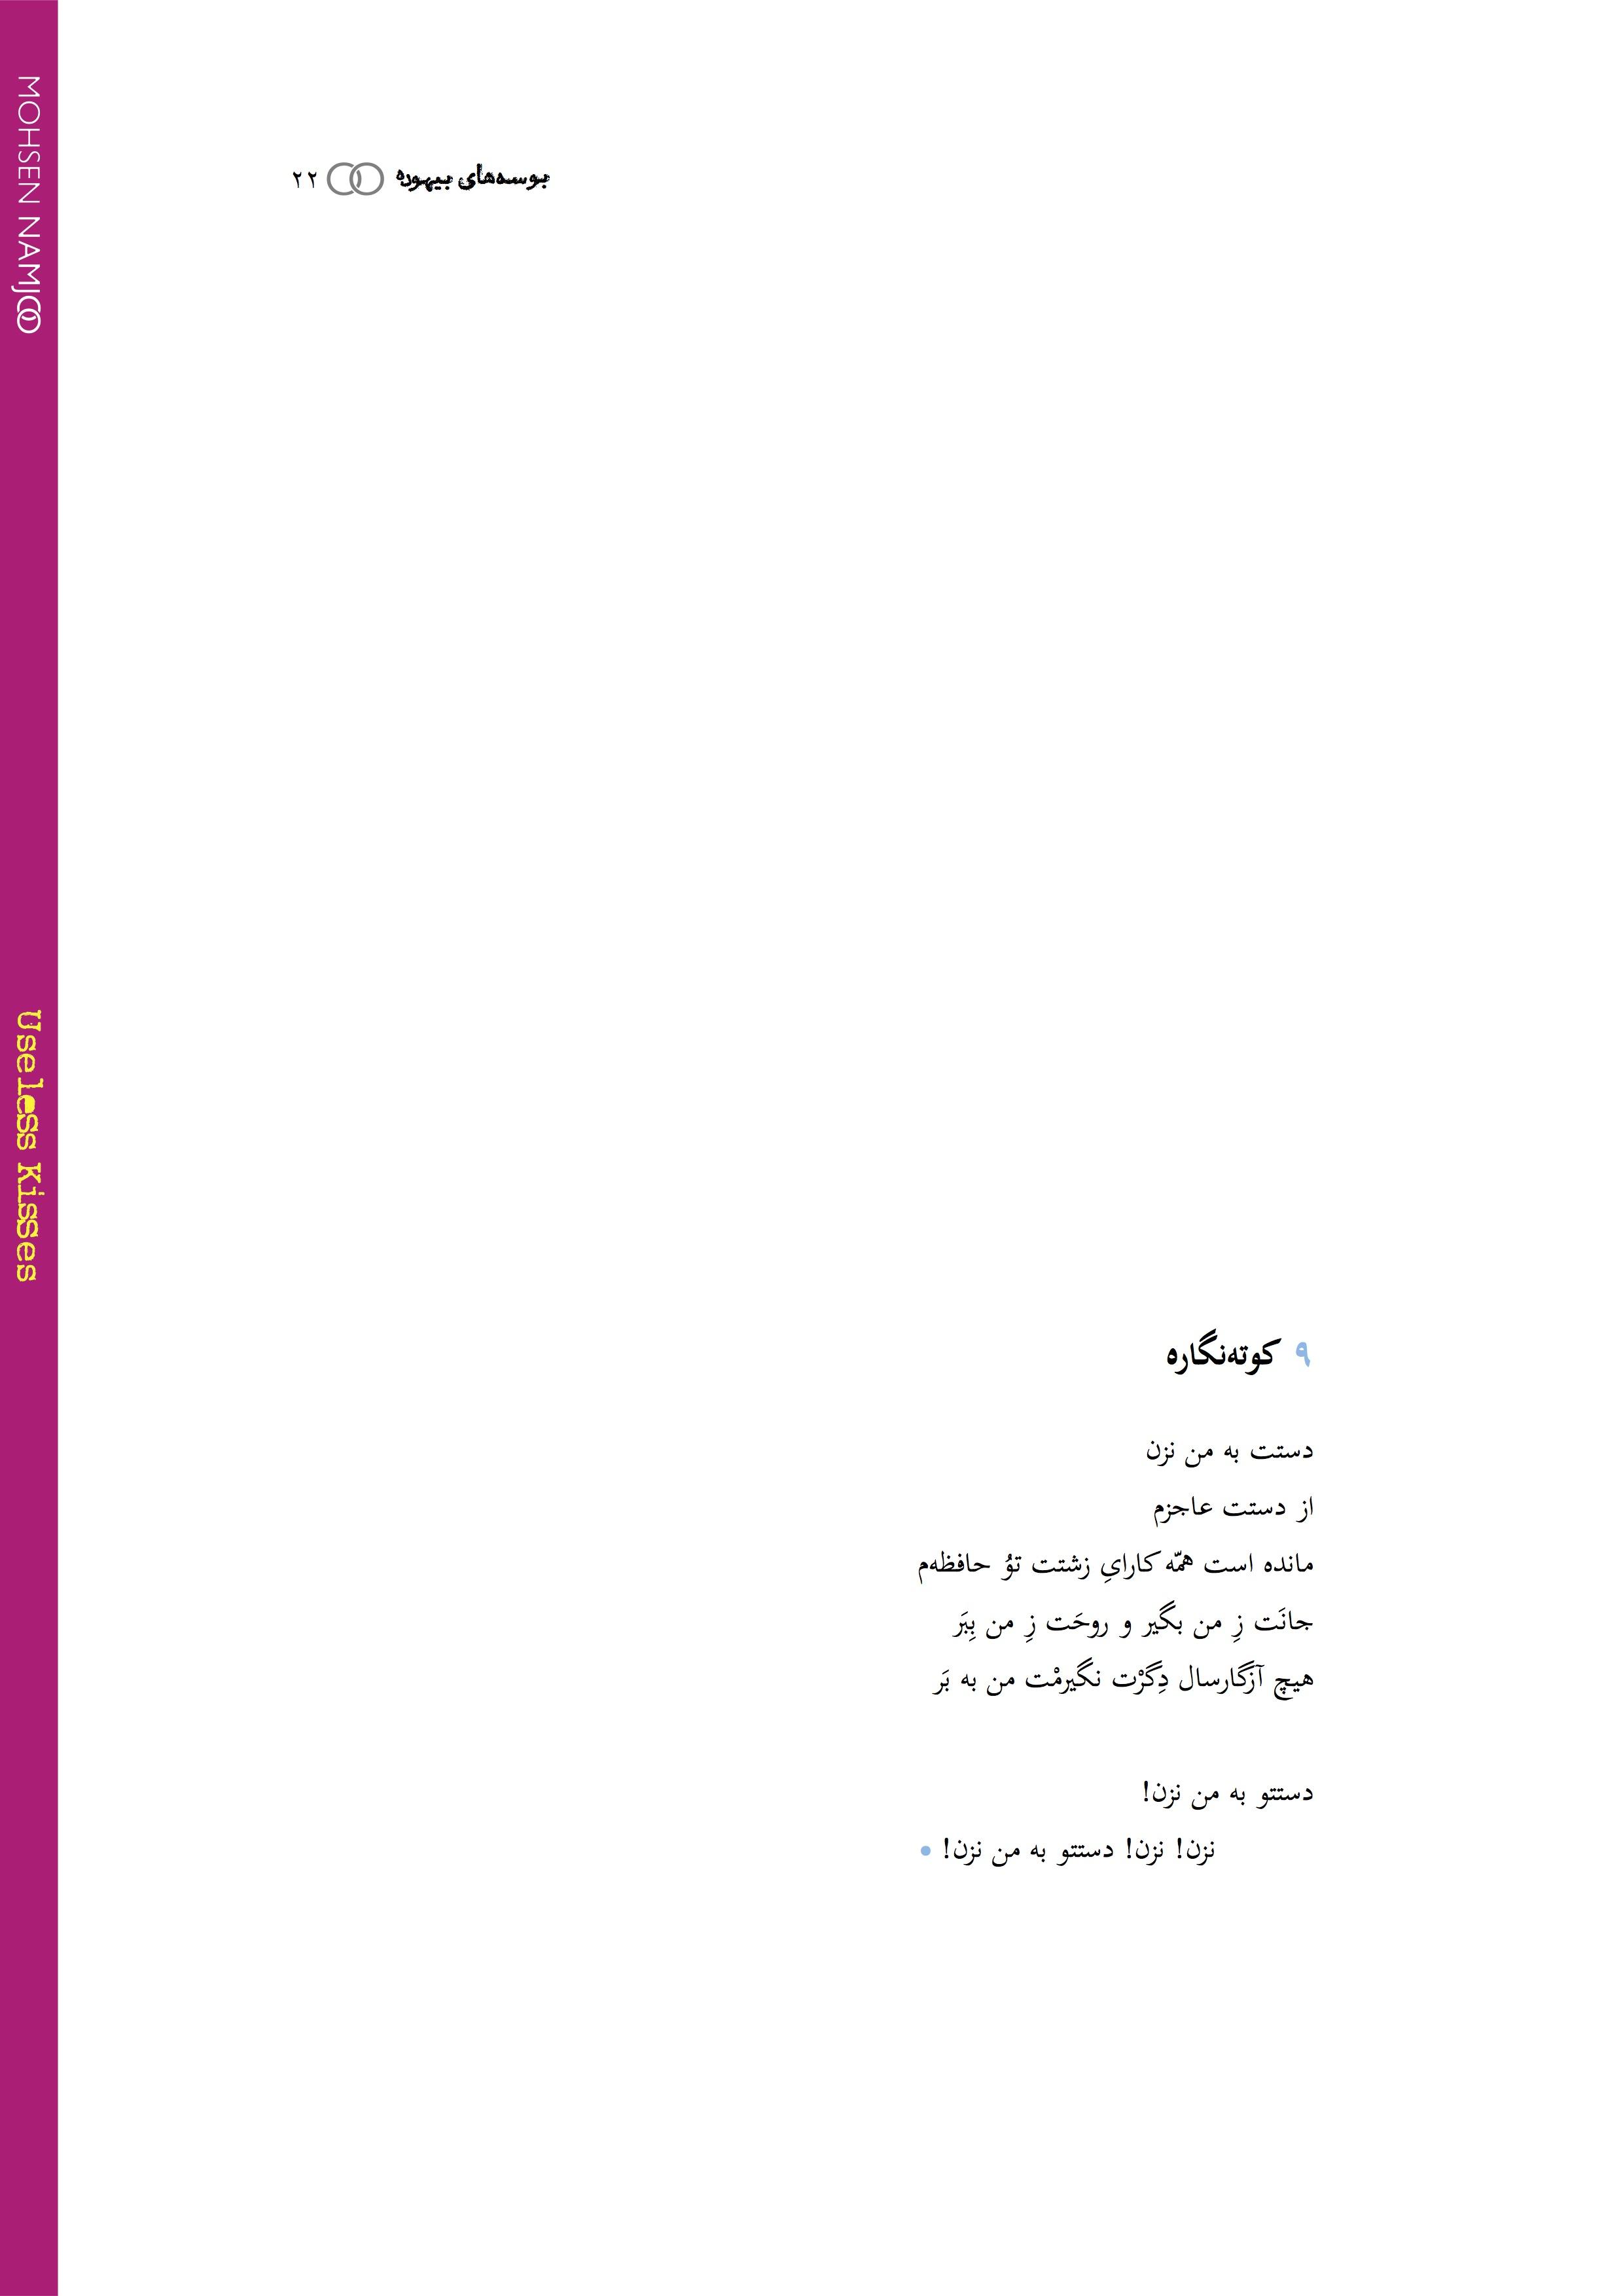 21Useless Kisses eBook (2nd Edition).jpg